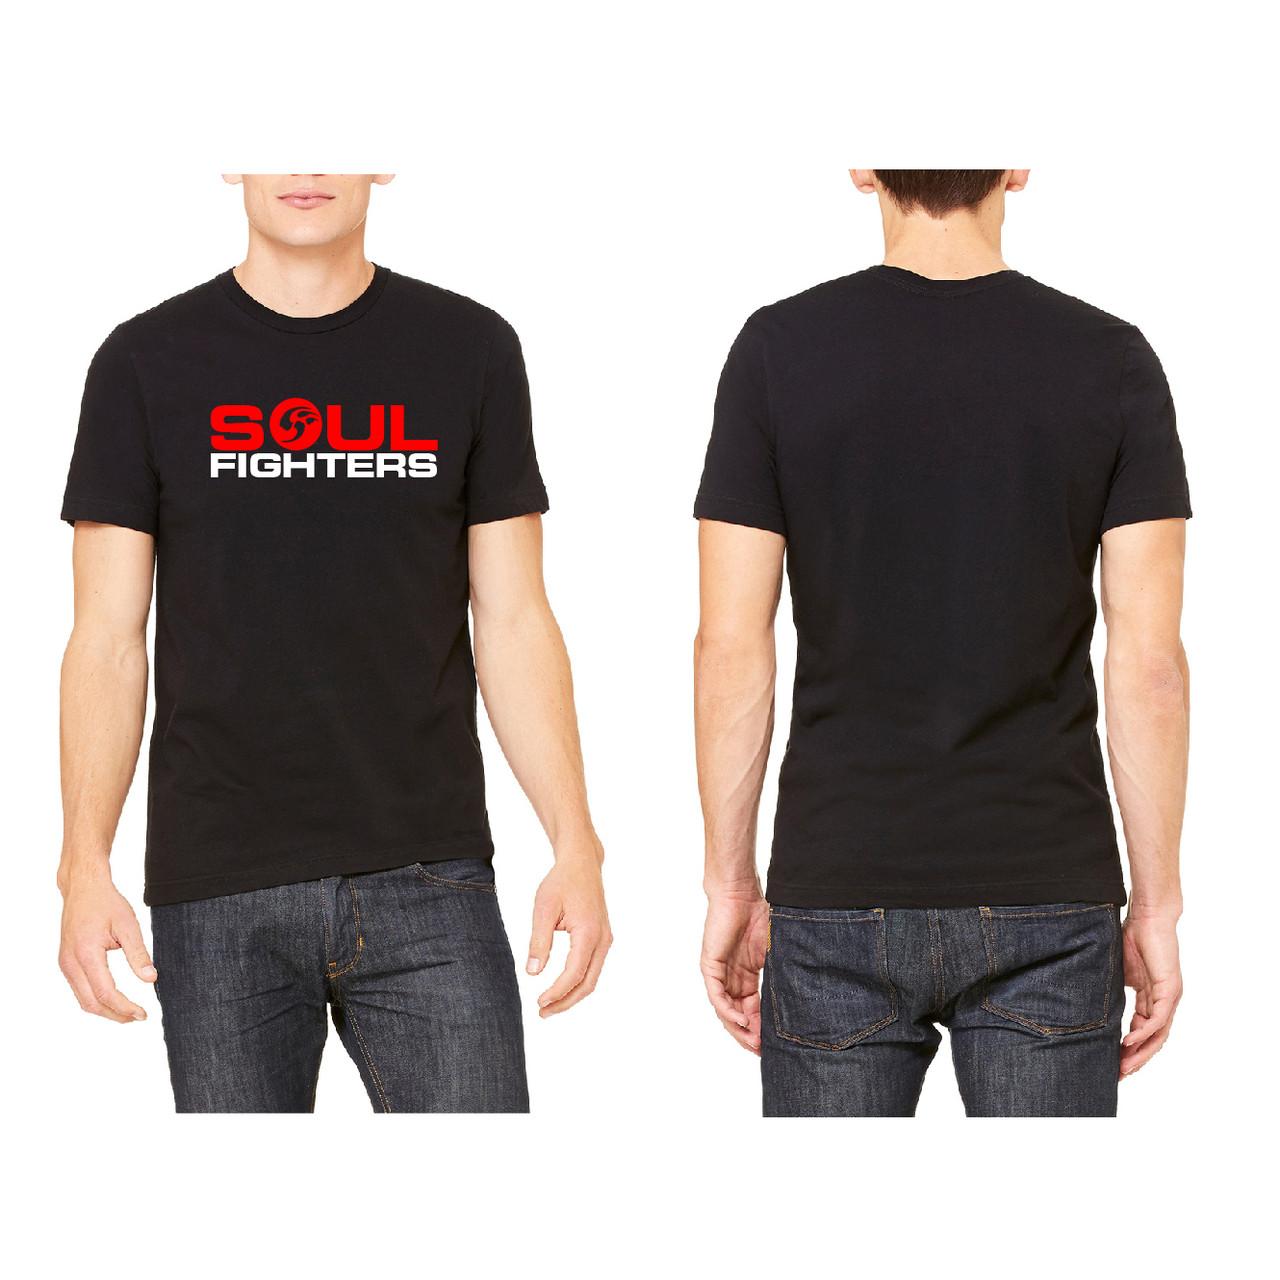 Brand new Men's Black Chest Logo T-shirt - SoulFighters QX62